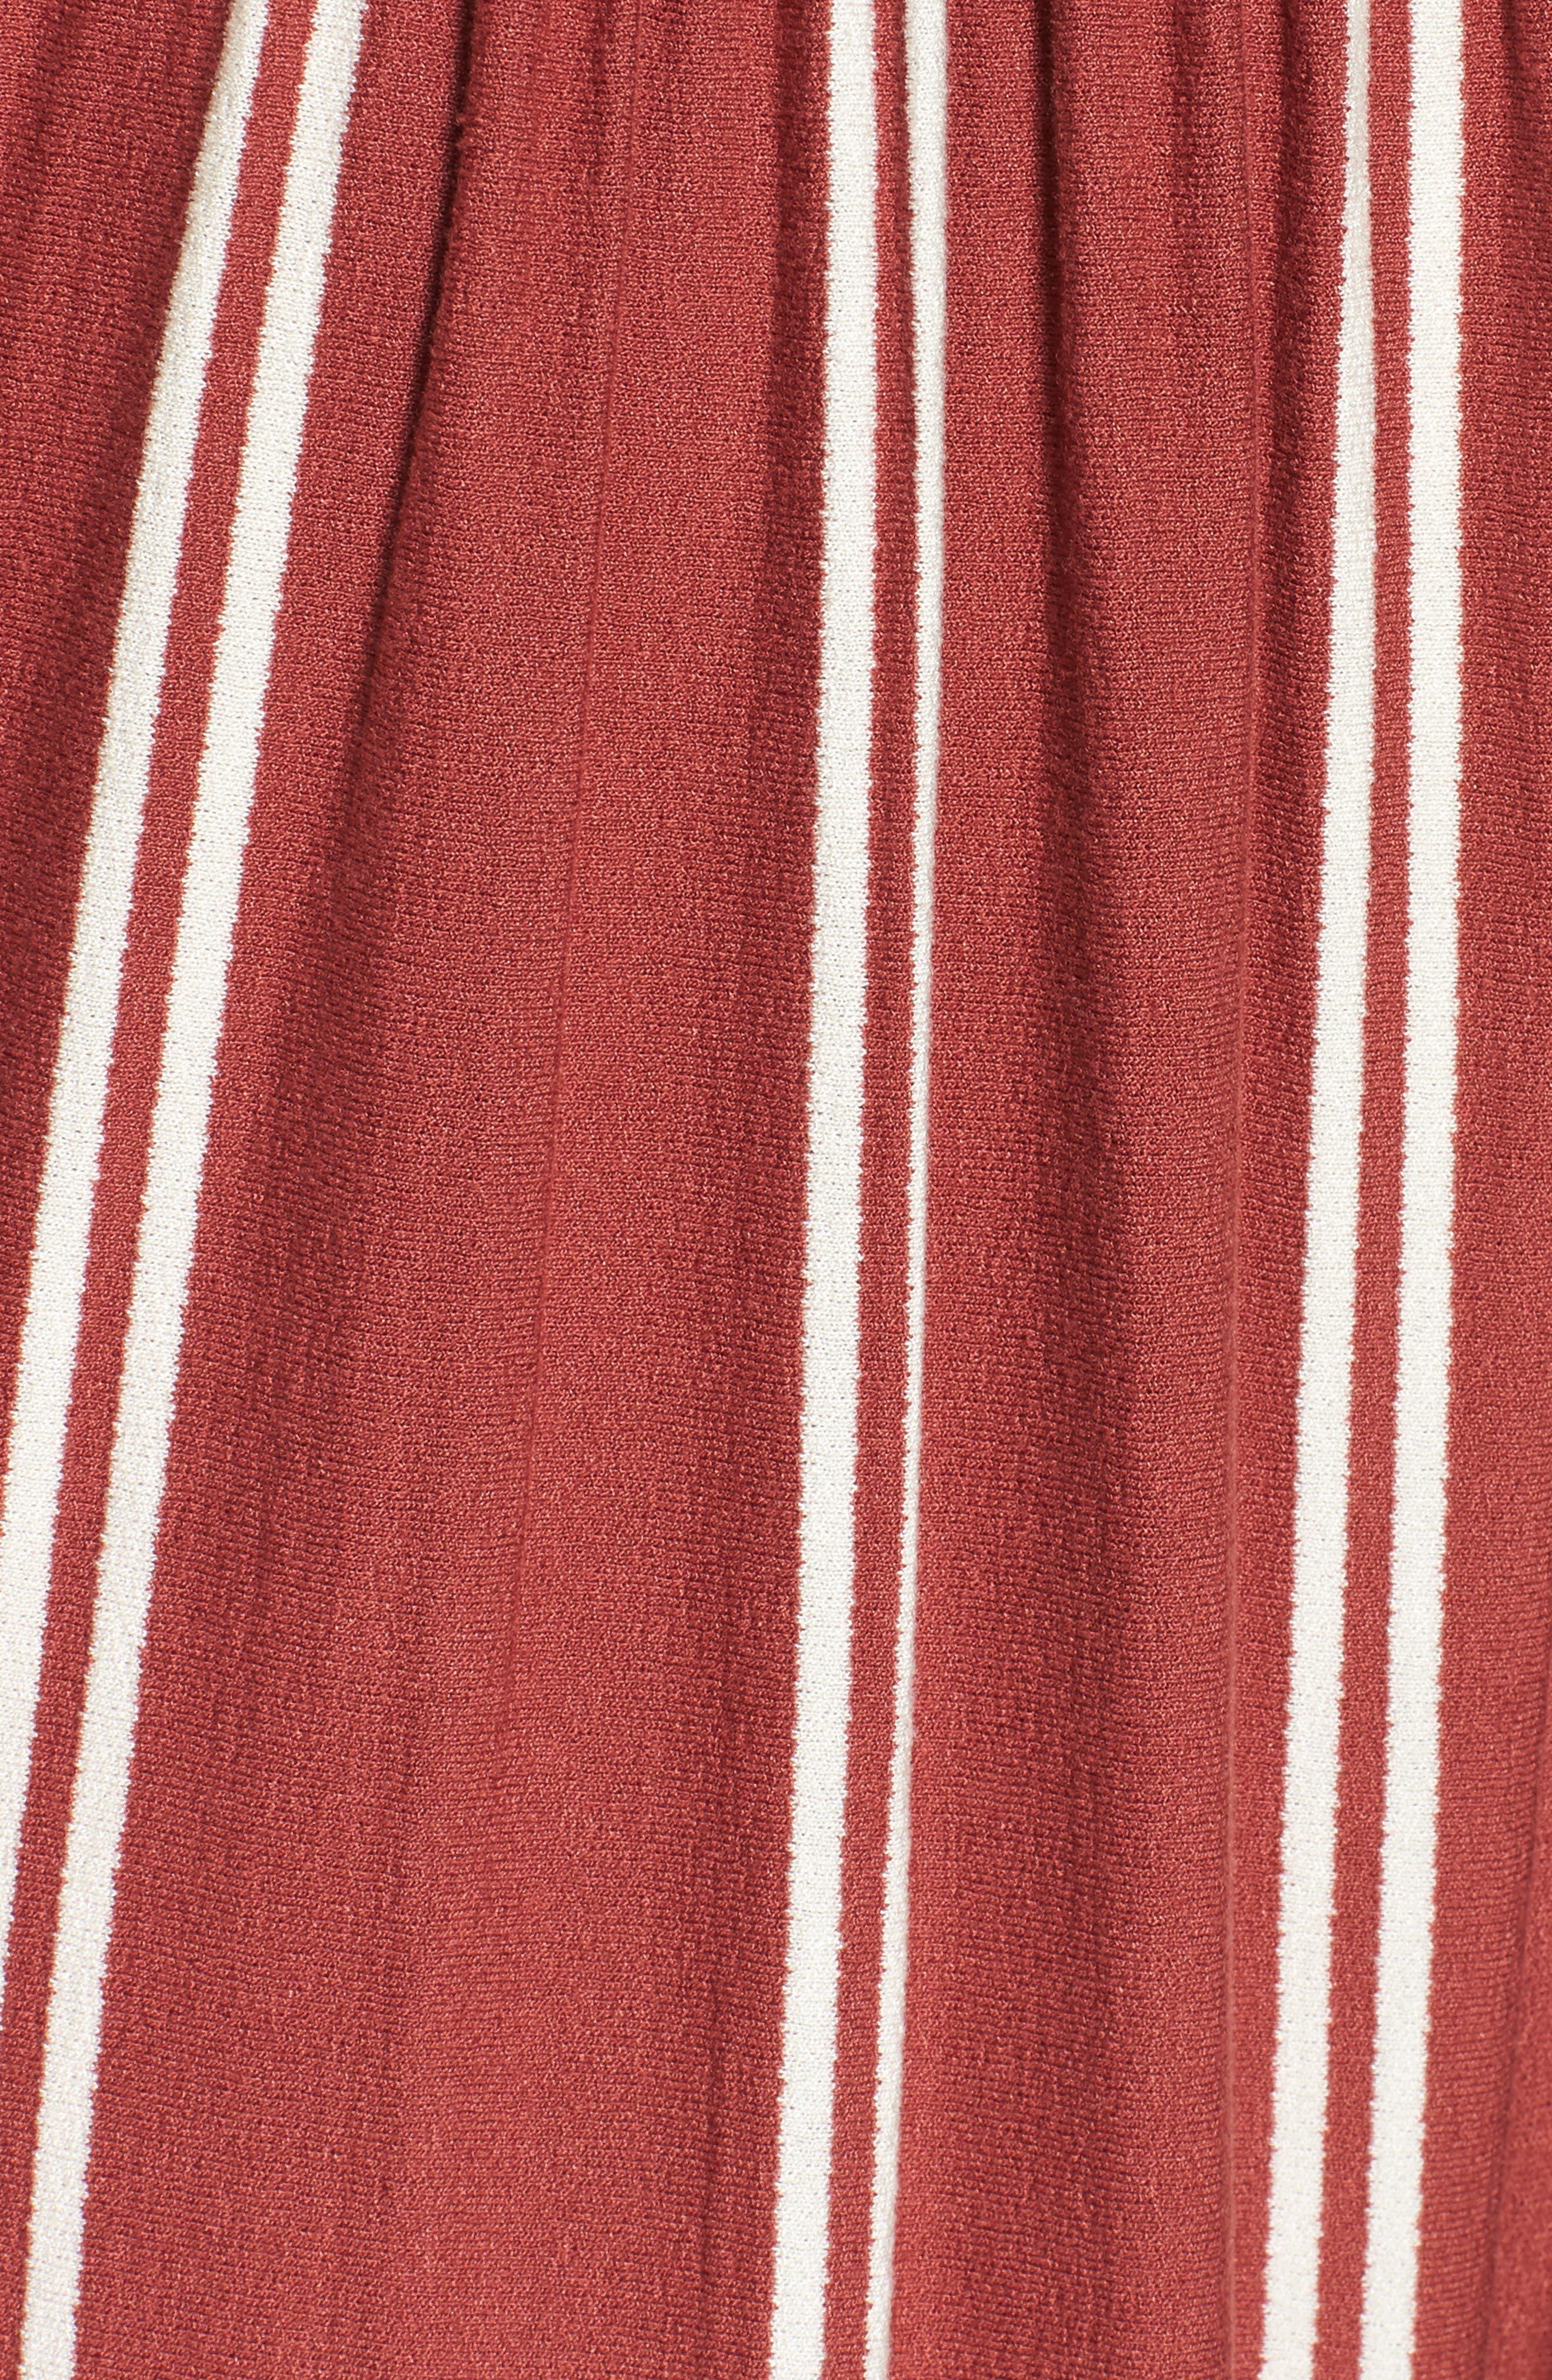 Smocked Ruffle Hem Jumpsuit,                             Alternate thumbnail 6, color,                             221